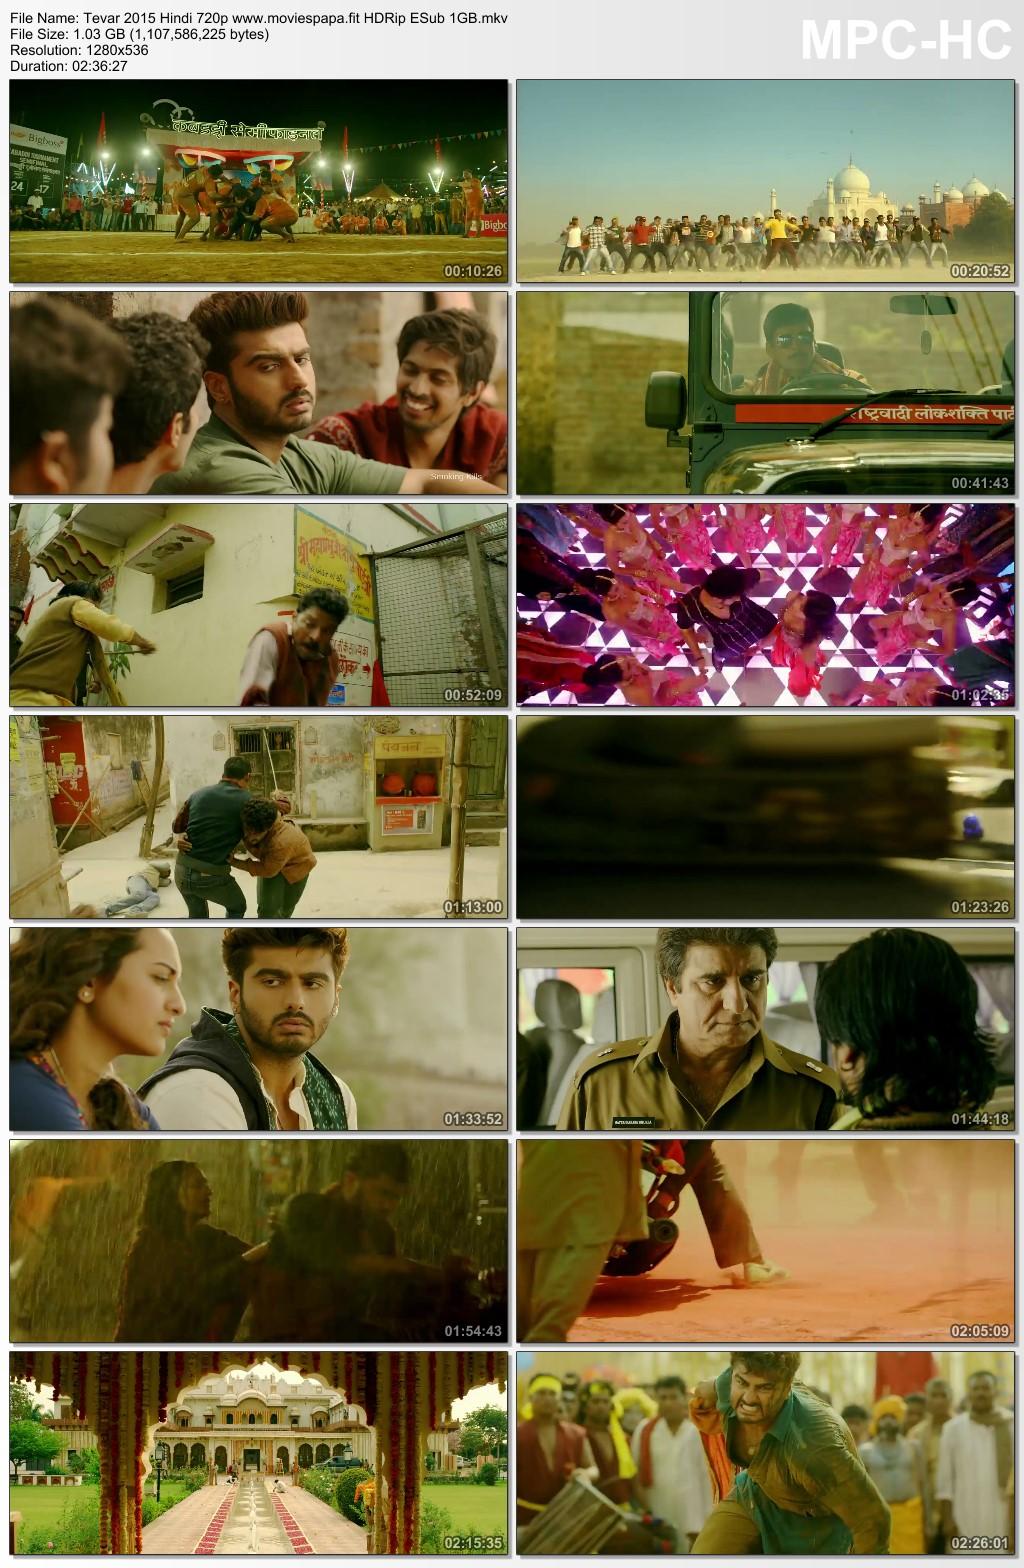 Tevar 2015 Hindi Movie 720p HDRip ESub 1.1GB Download